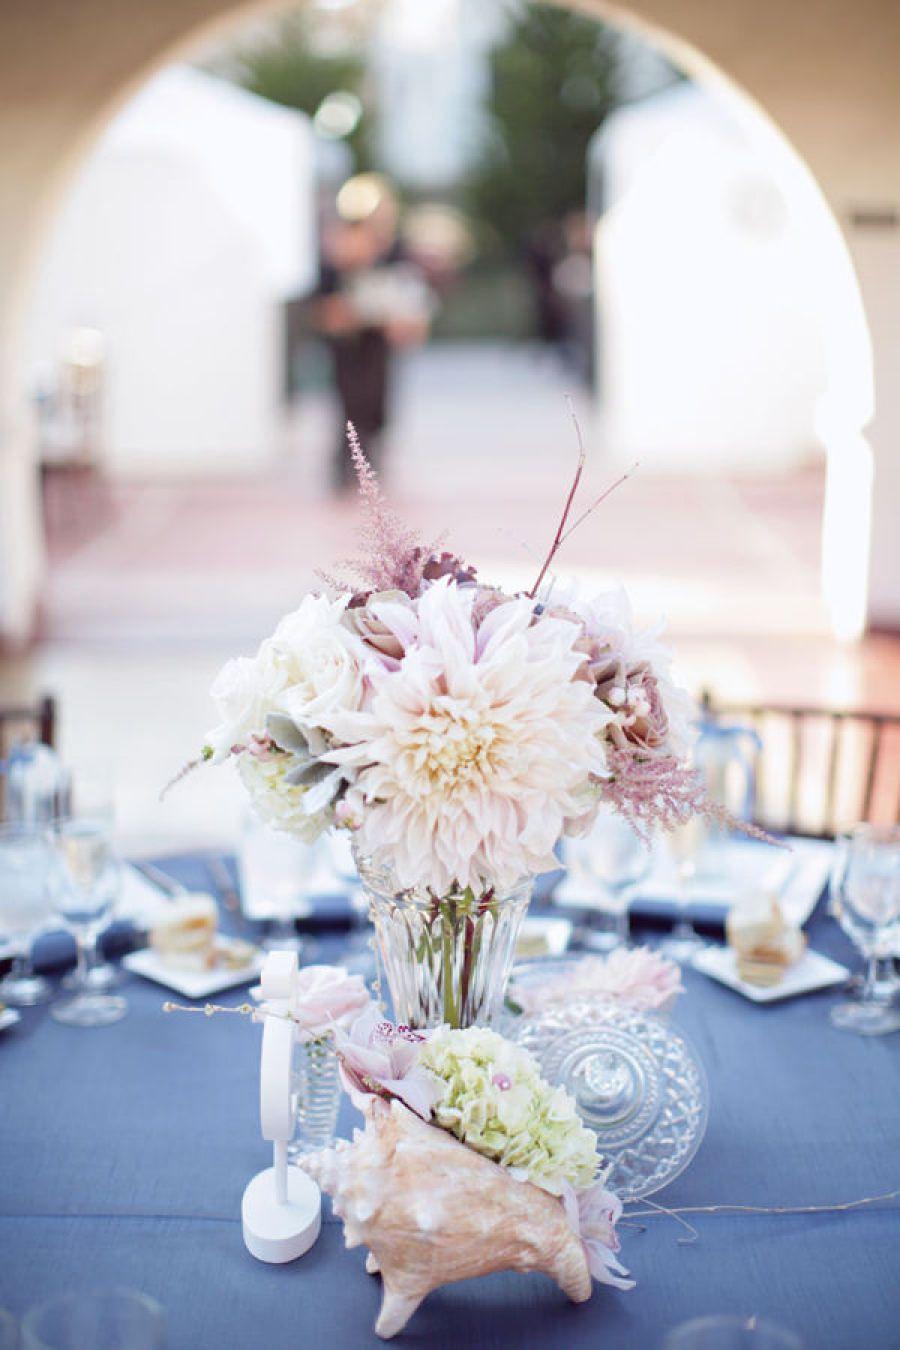 Casa Romantica Wedding by Abi Q Photography   Crystal vase ...